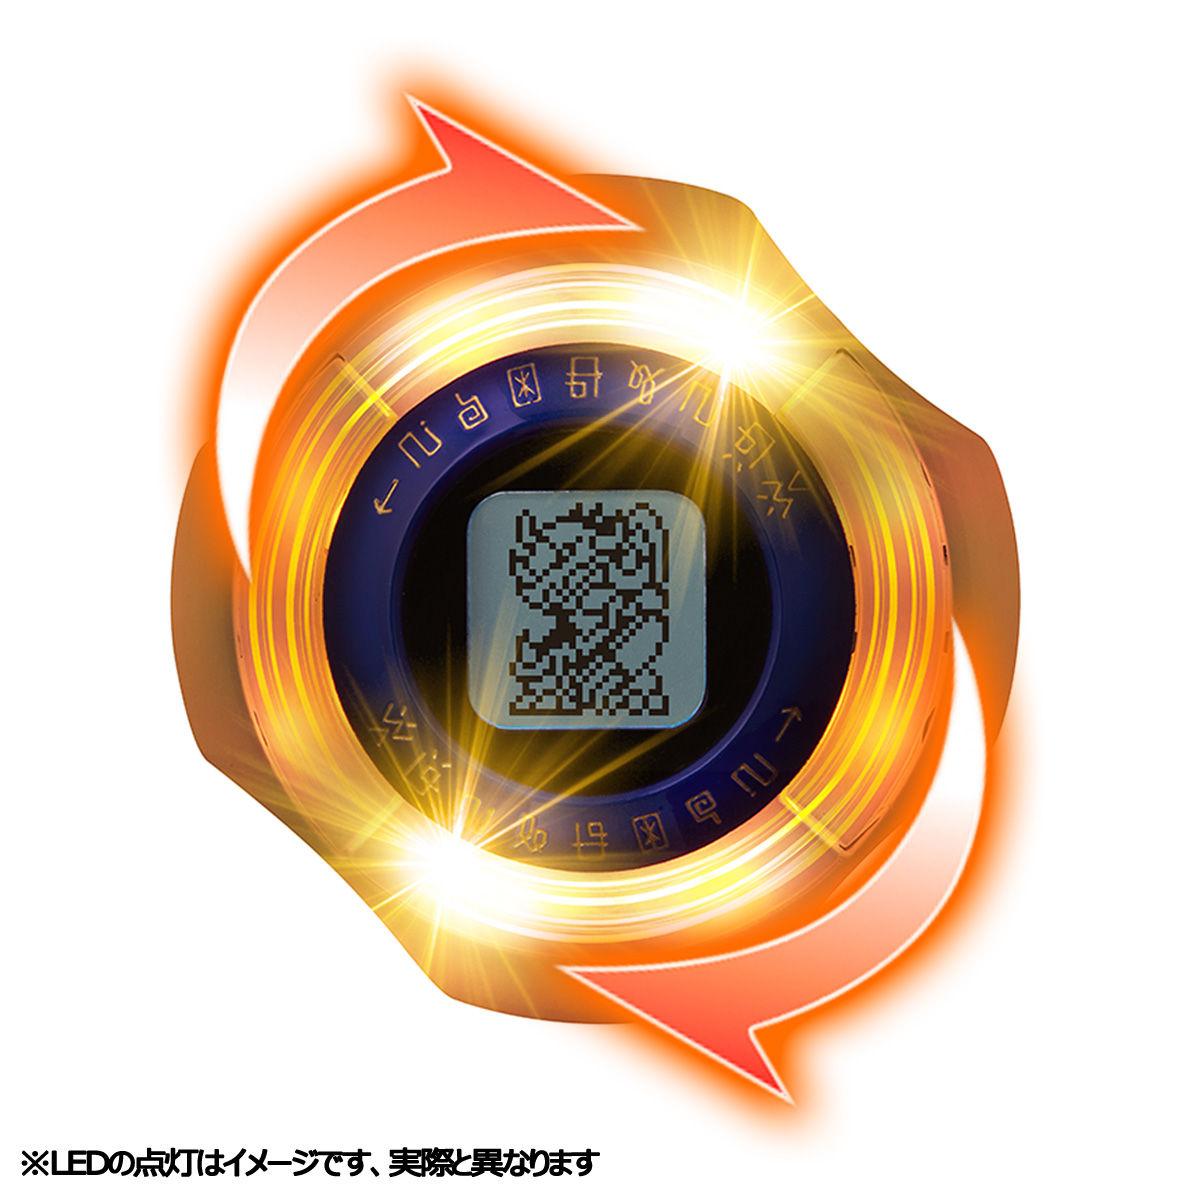 digivice2020_12_june25_2020.jpg